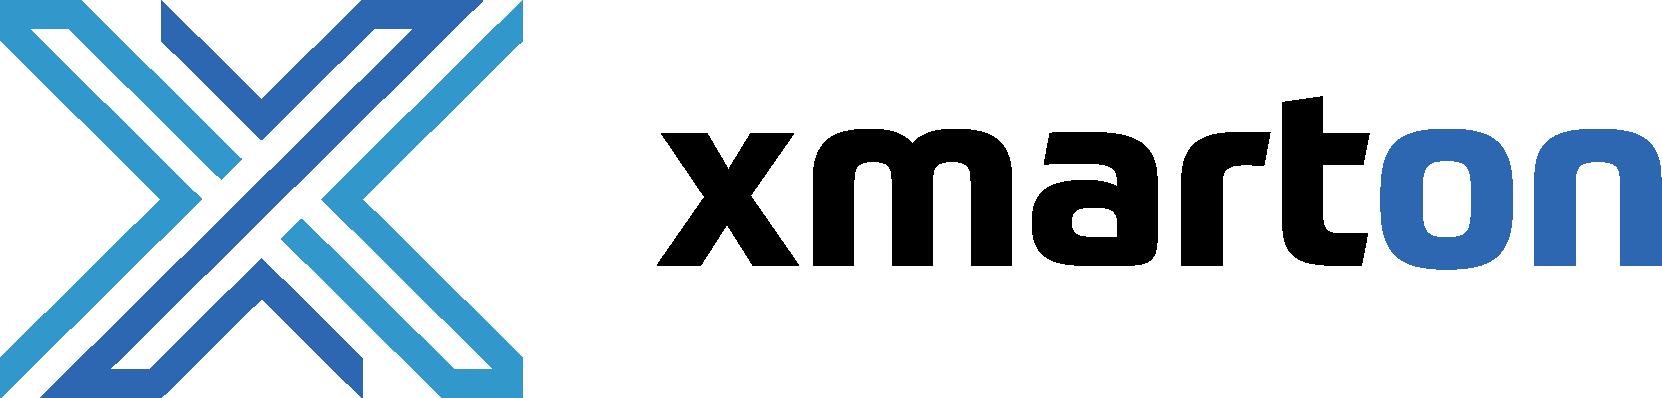 xmarton logo